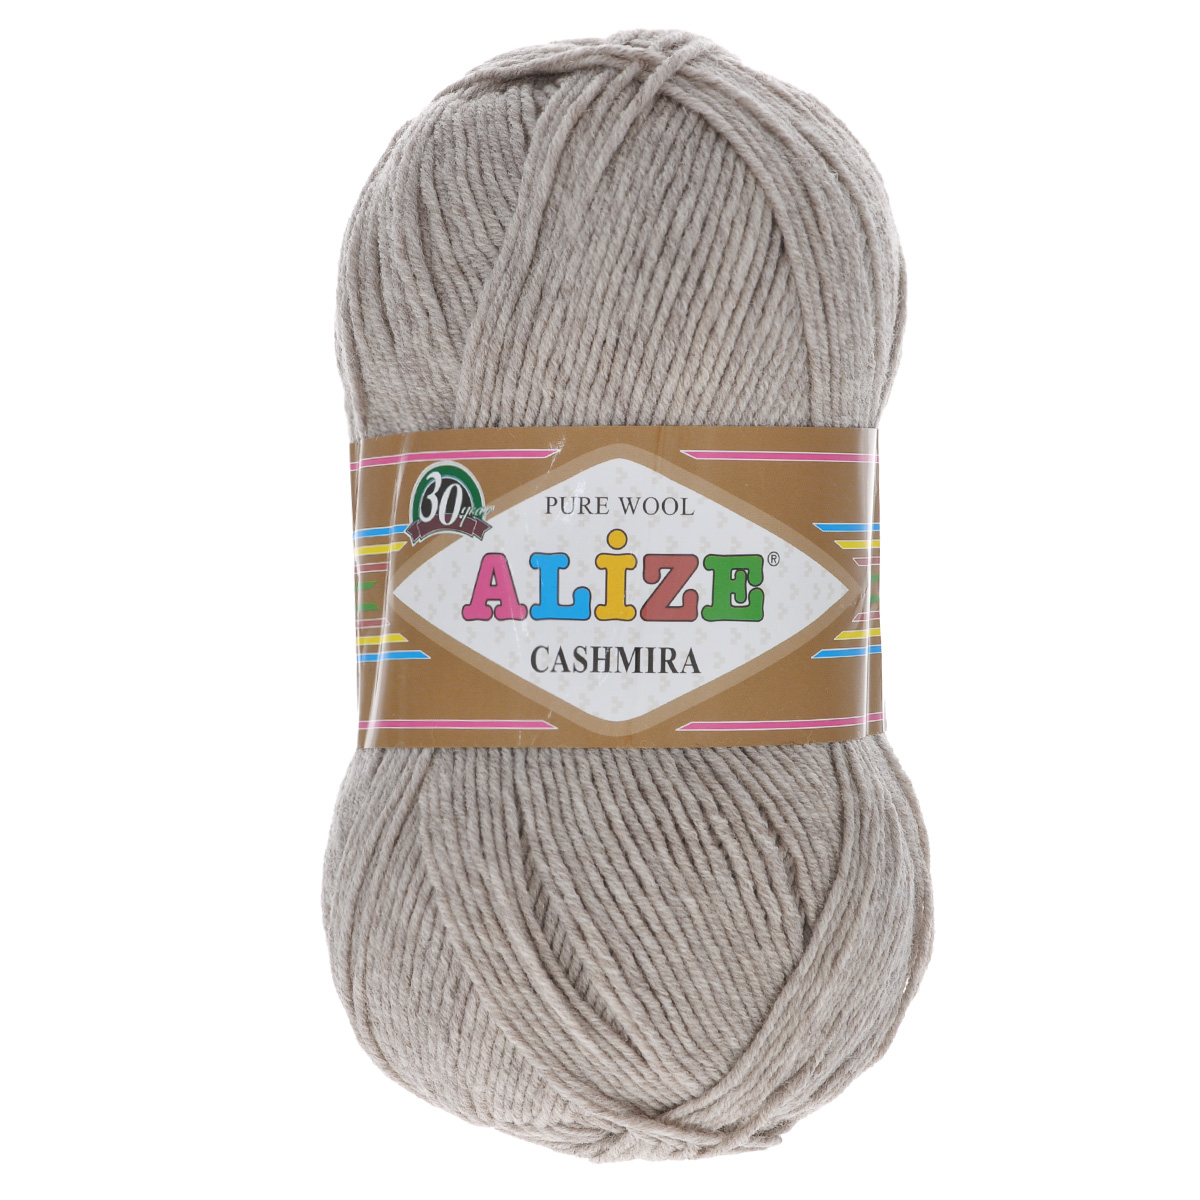 Пряжа для вязания Alize Cashmira, цвет: бежевый (152), 300 м, 100 г, 5 шт цена